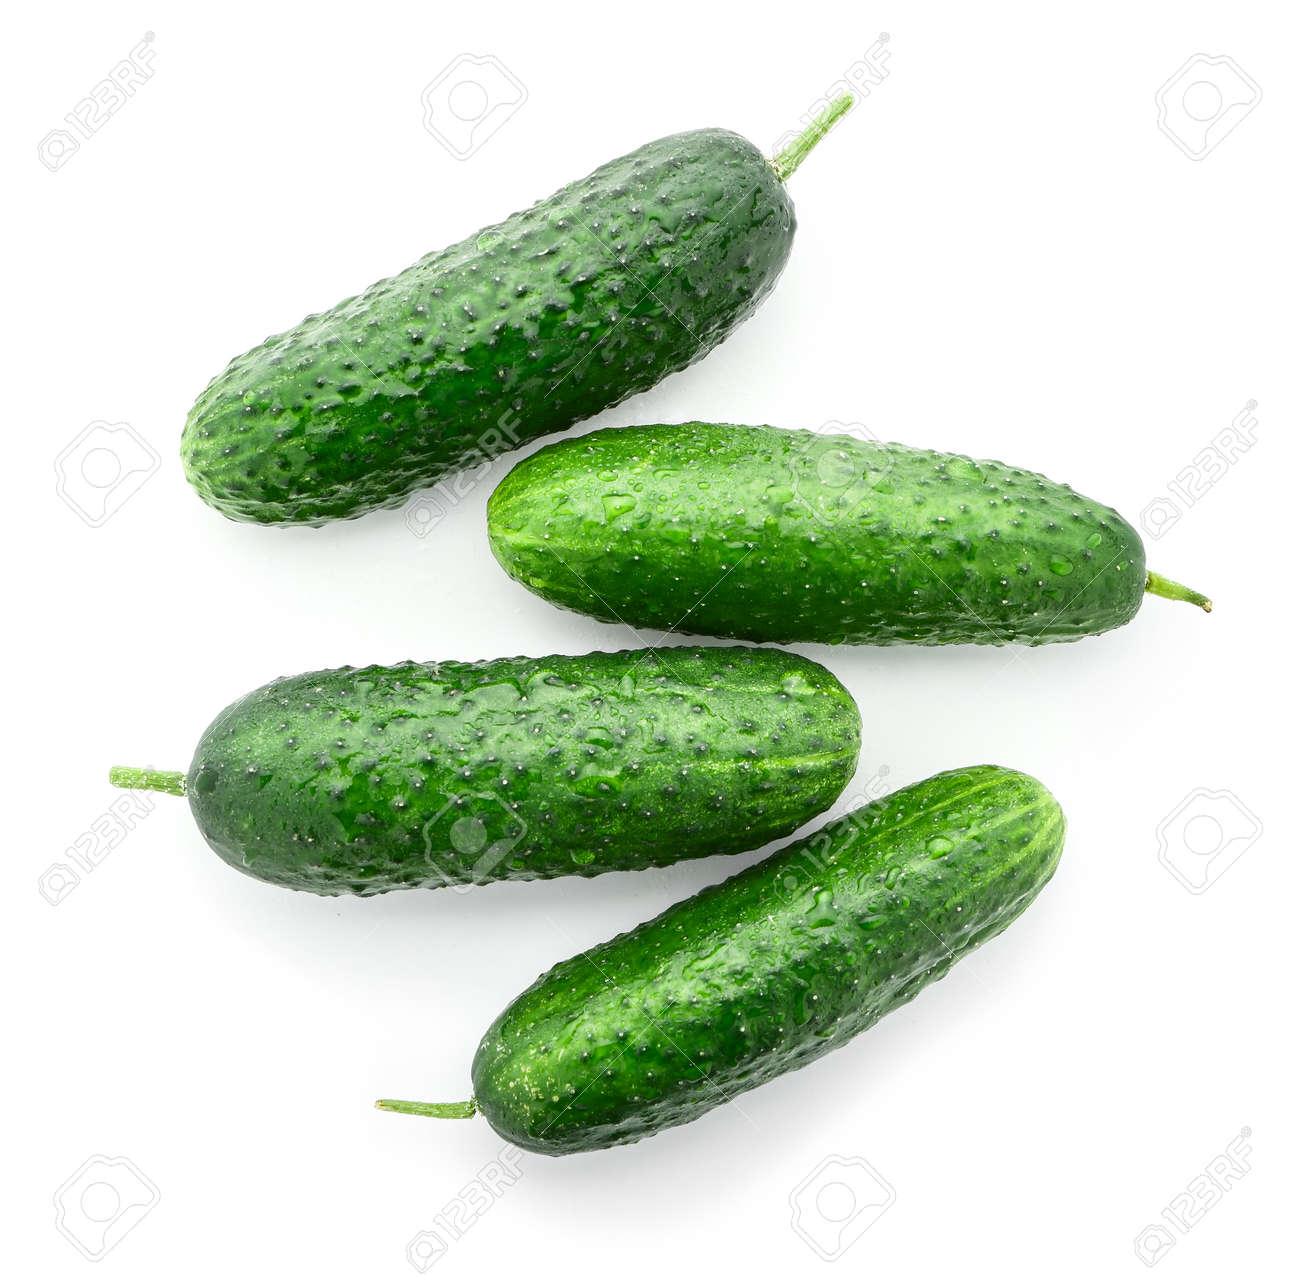 Fresh green cucumbers on white background - 165955622